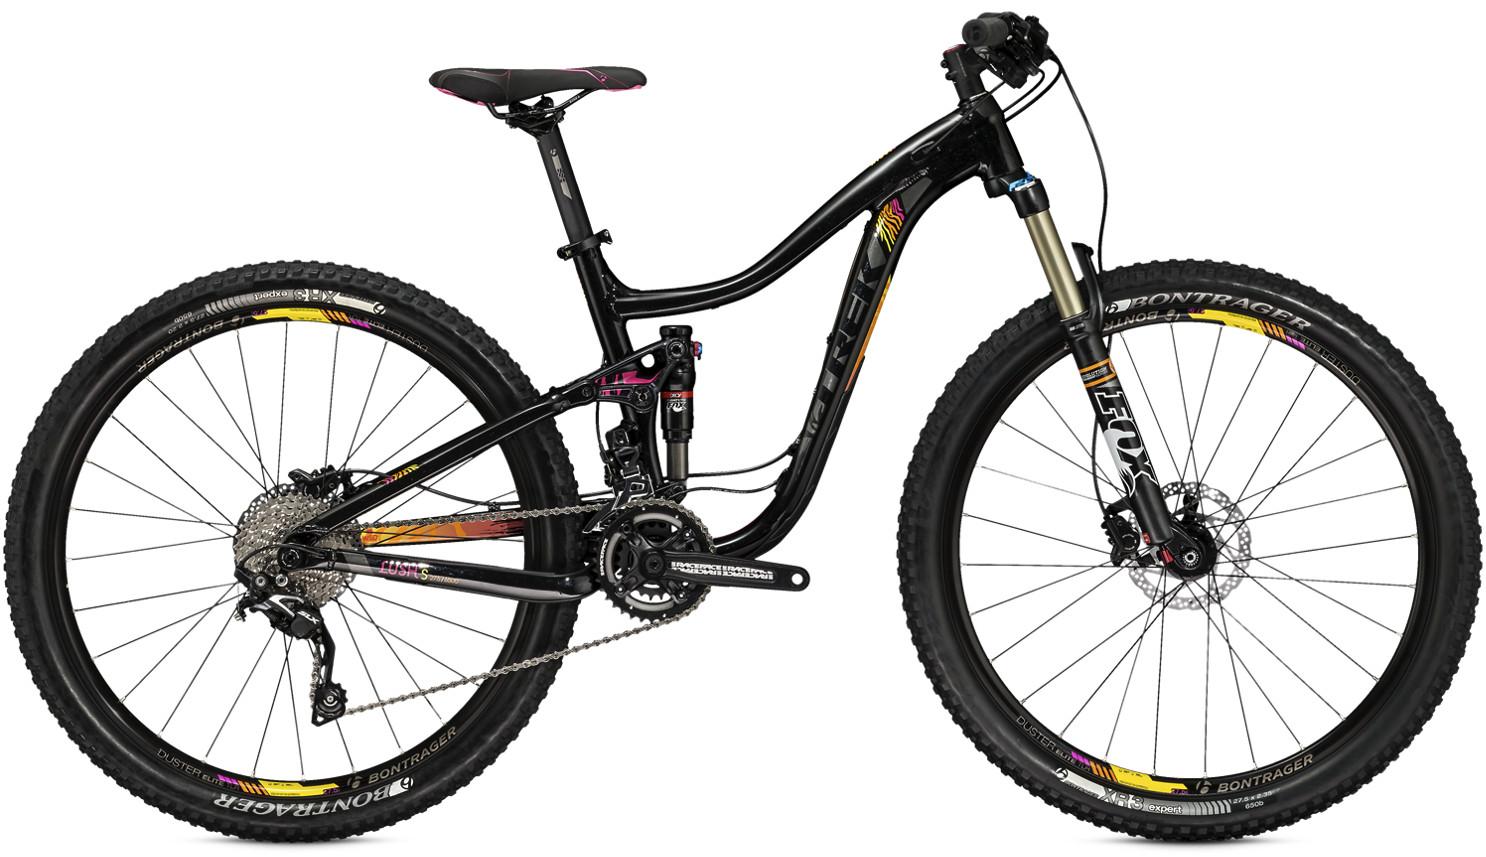 Trek Lush S 27.5 Bike